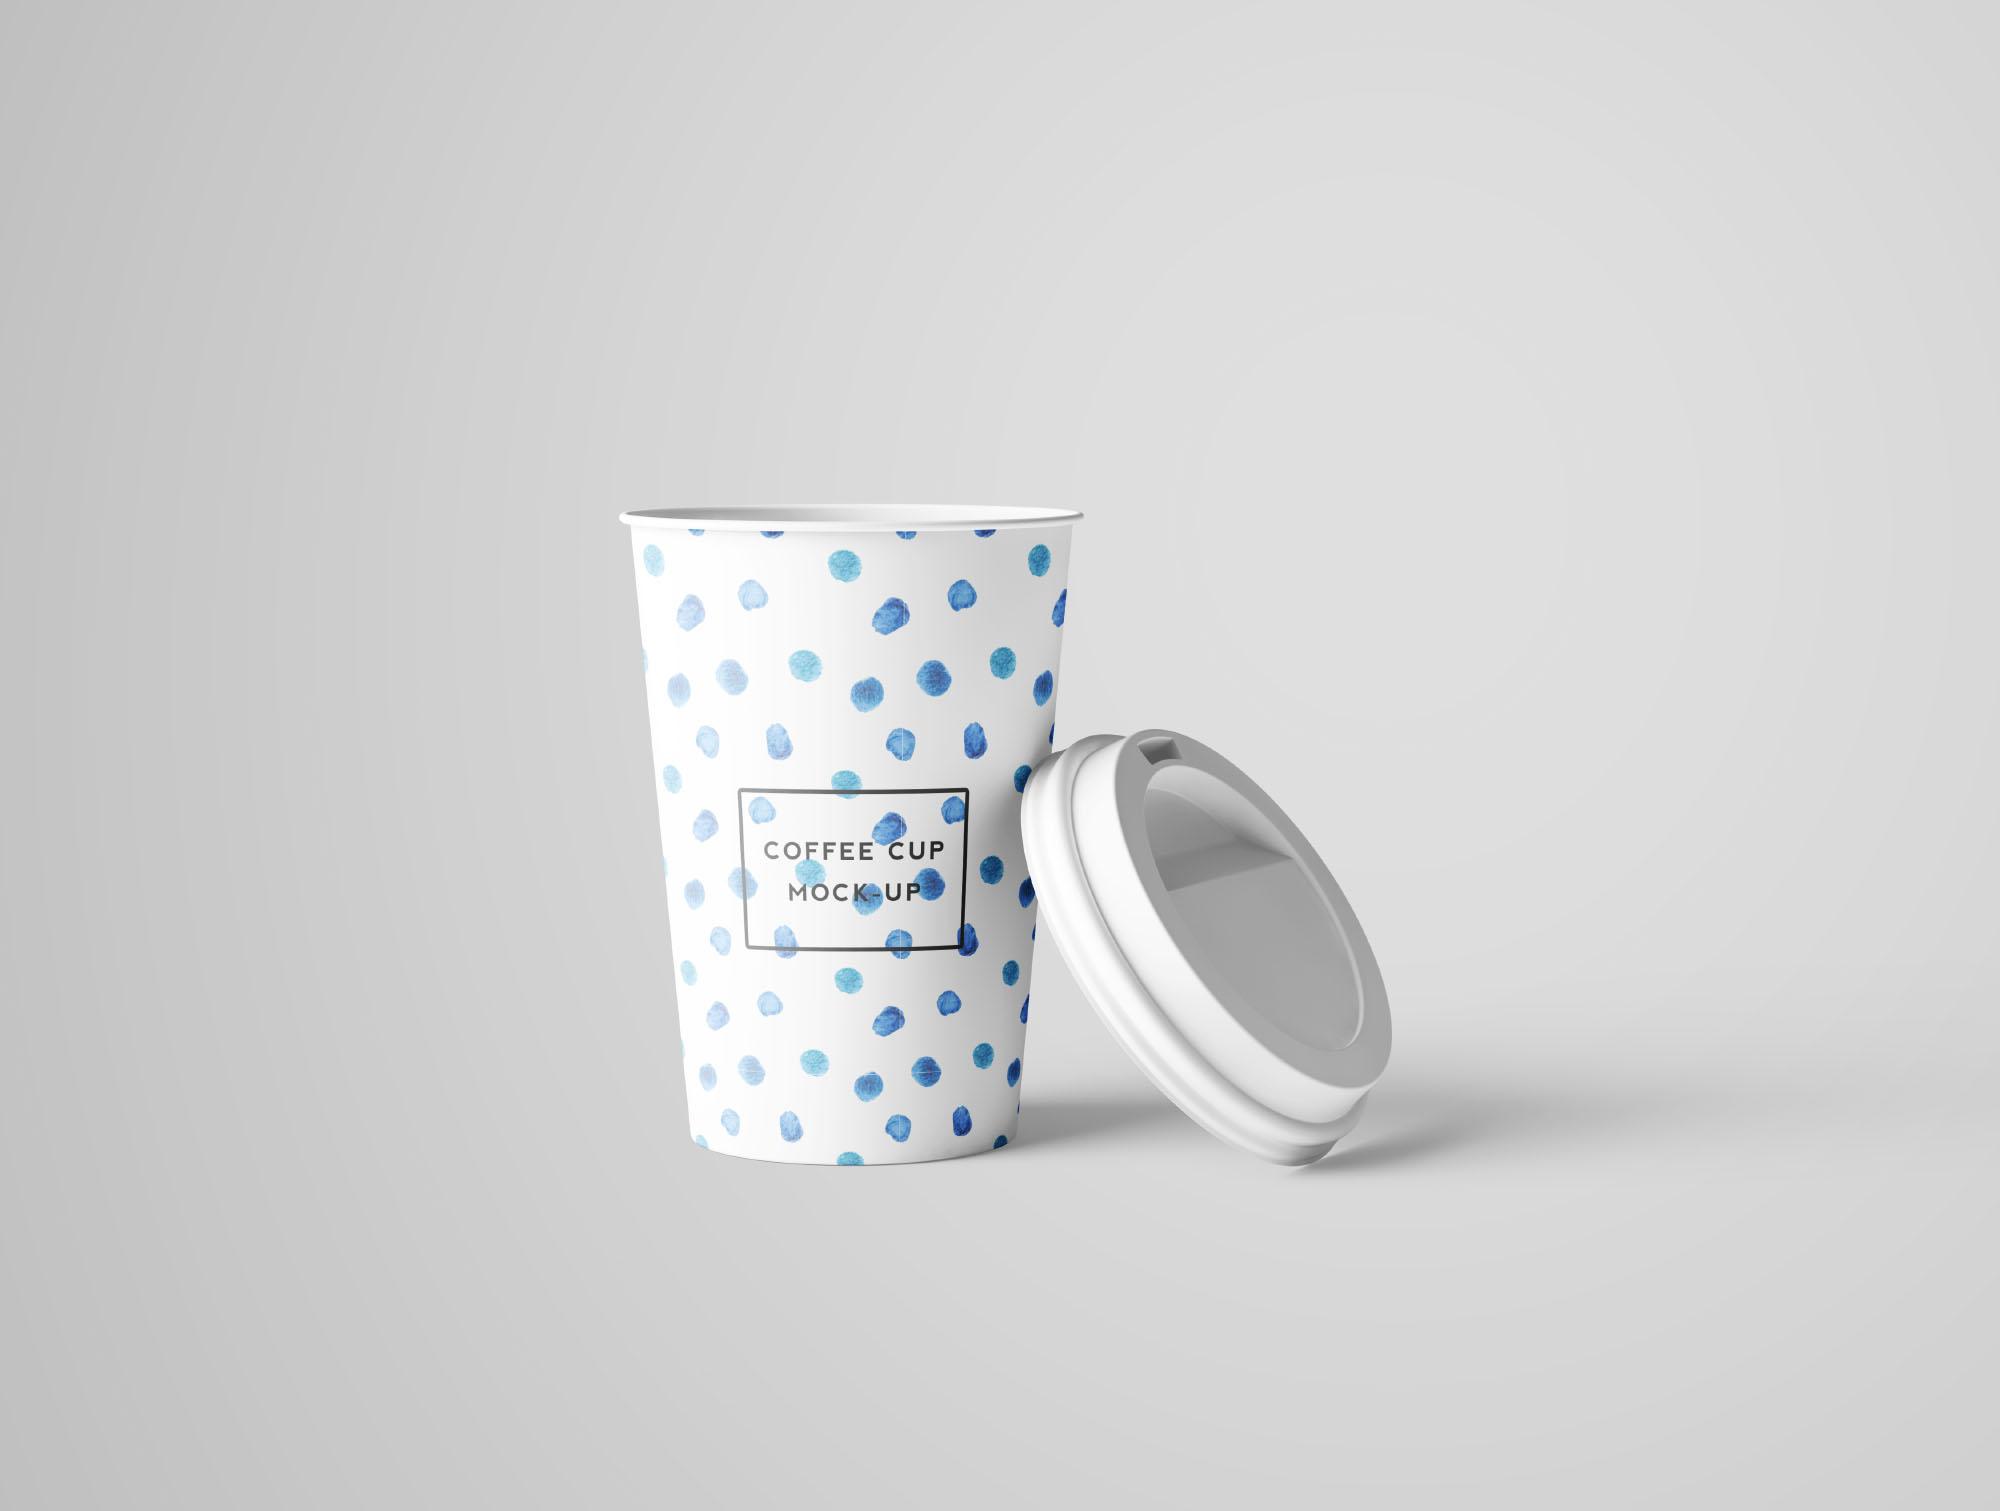 Coffee Cup Mockup - Opened